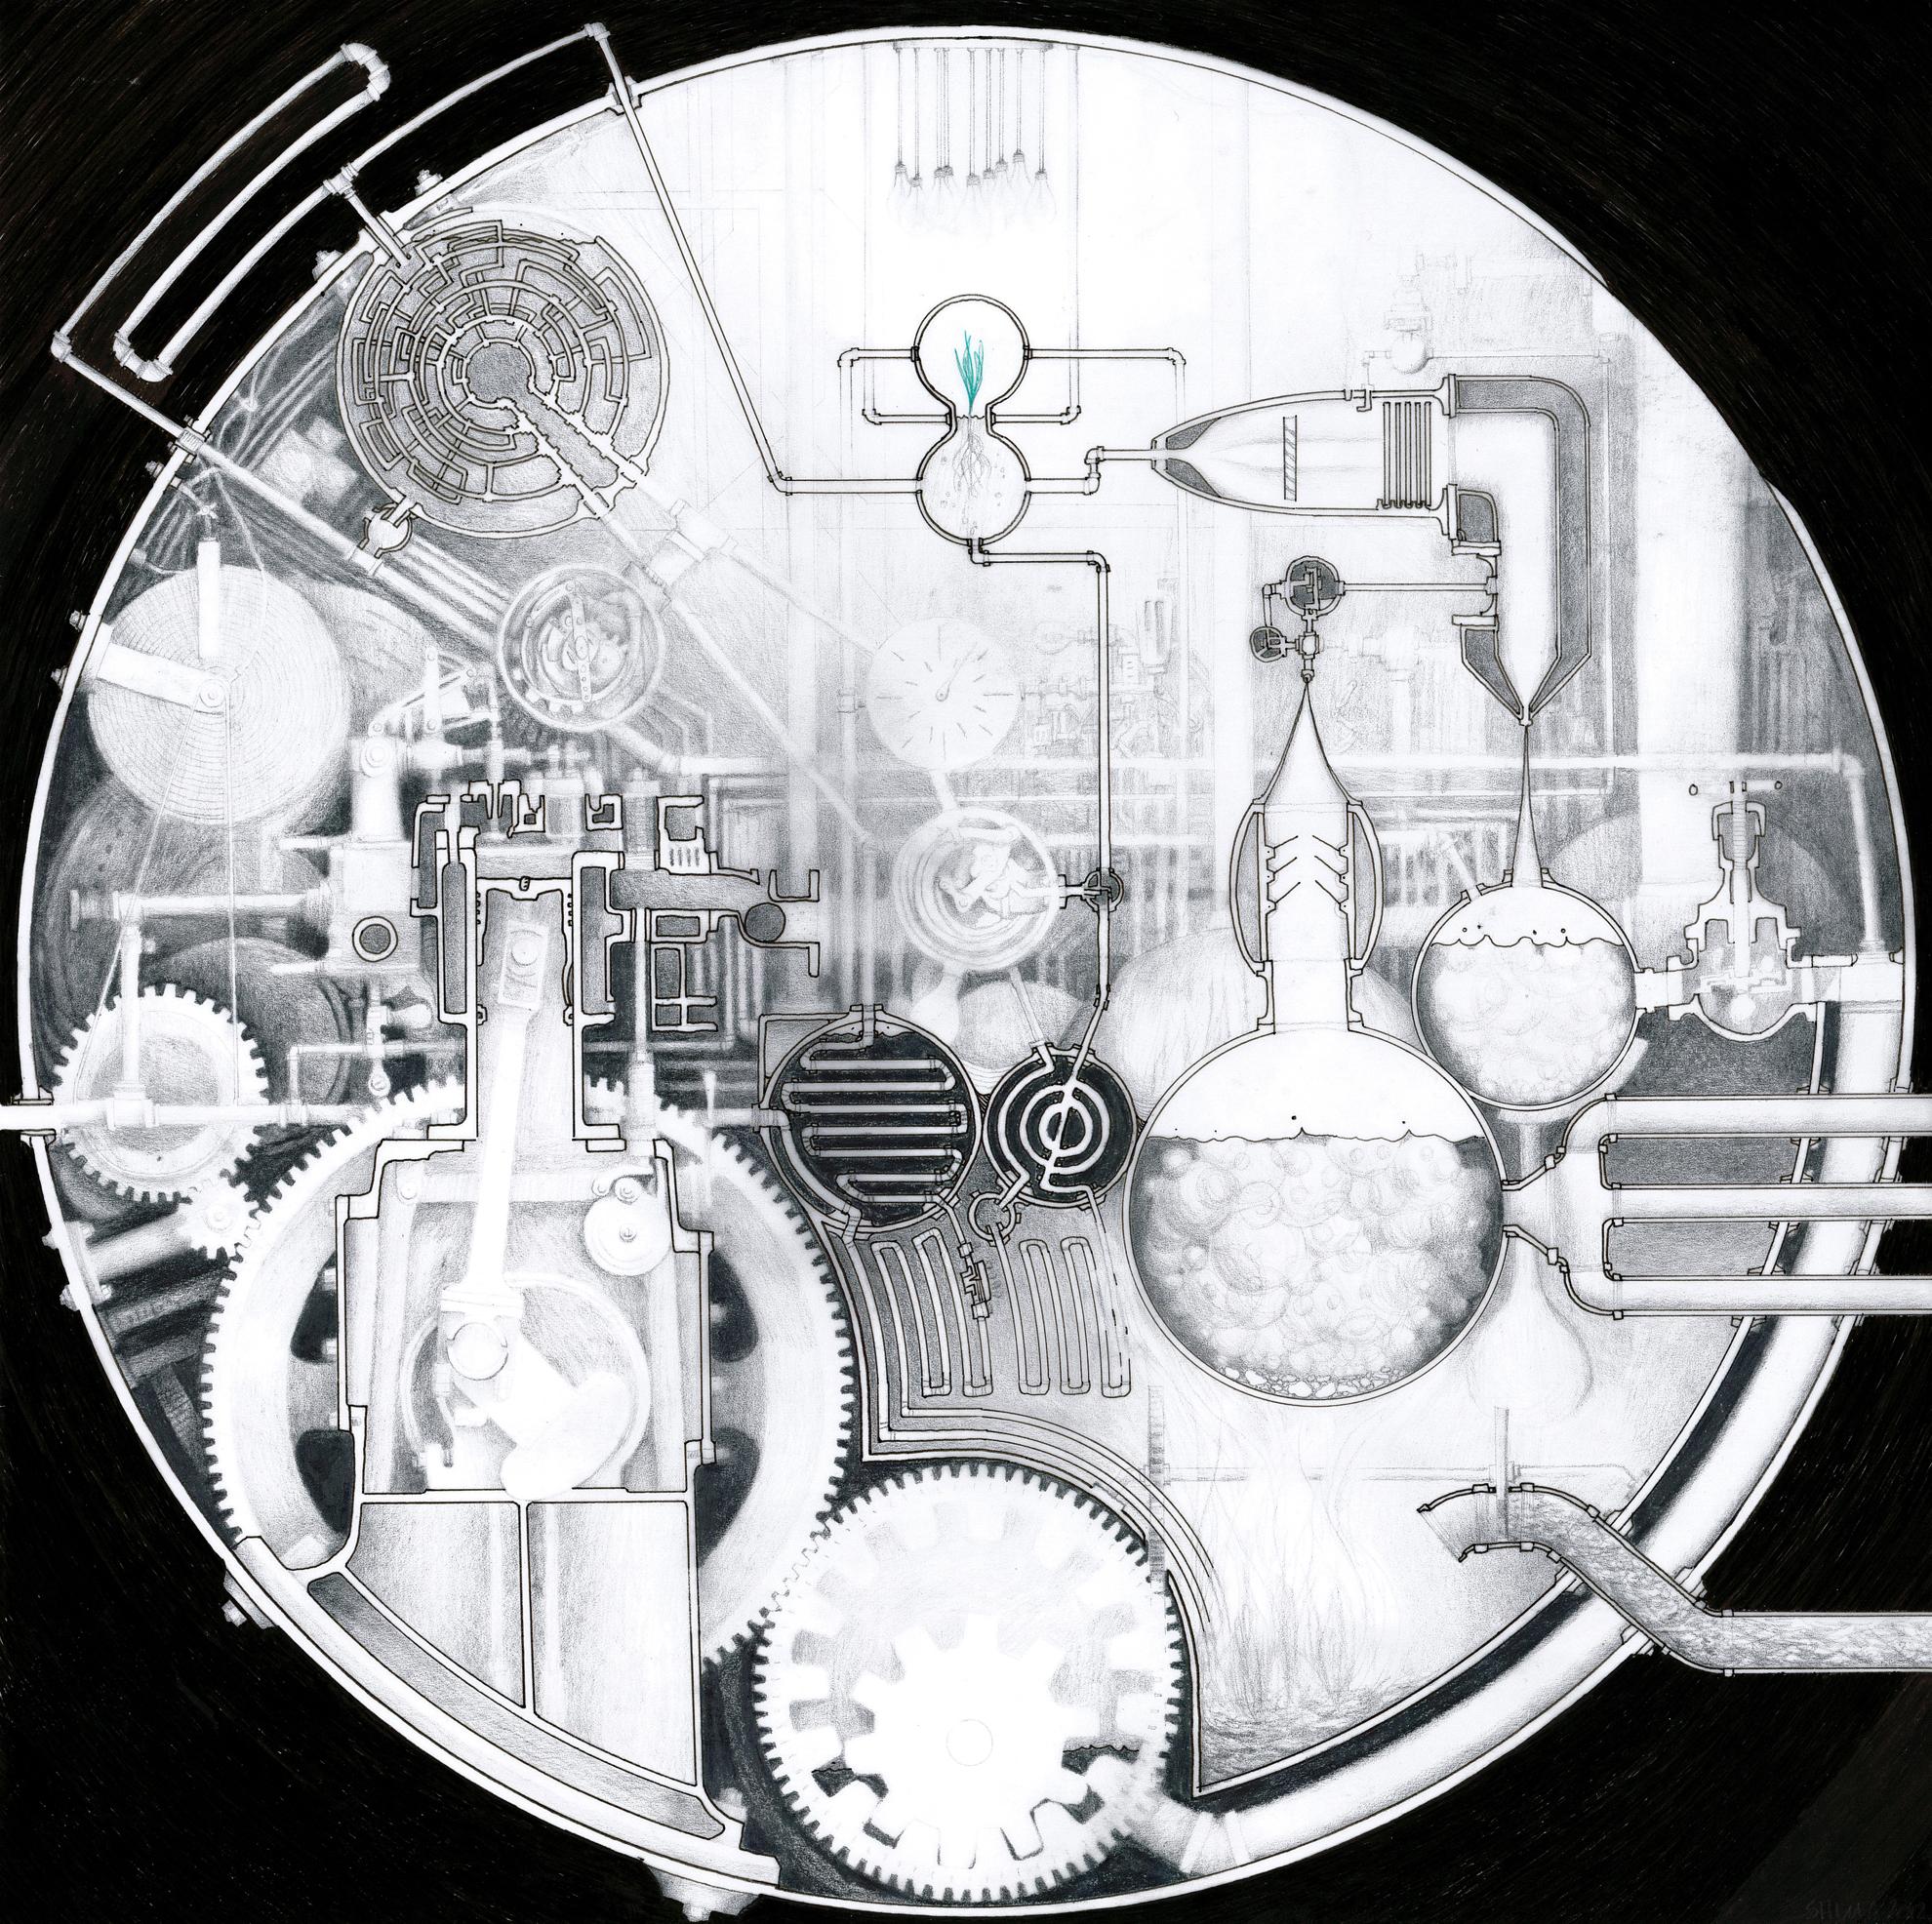 Drawn spheric ink Shima Vessel 12